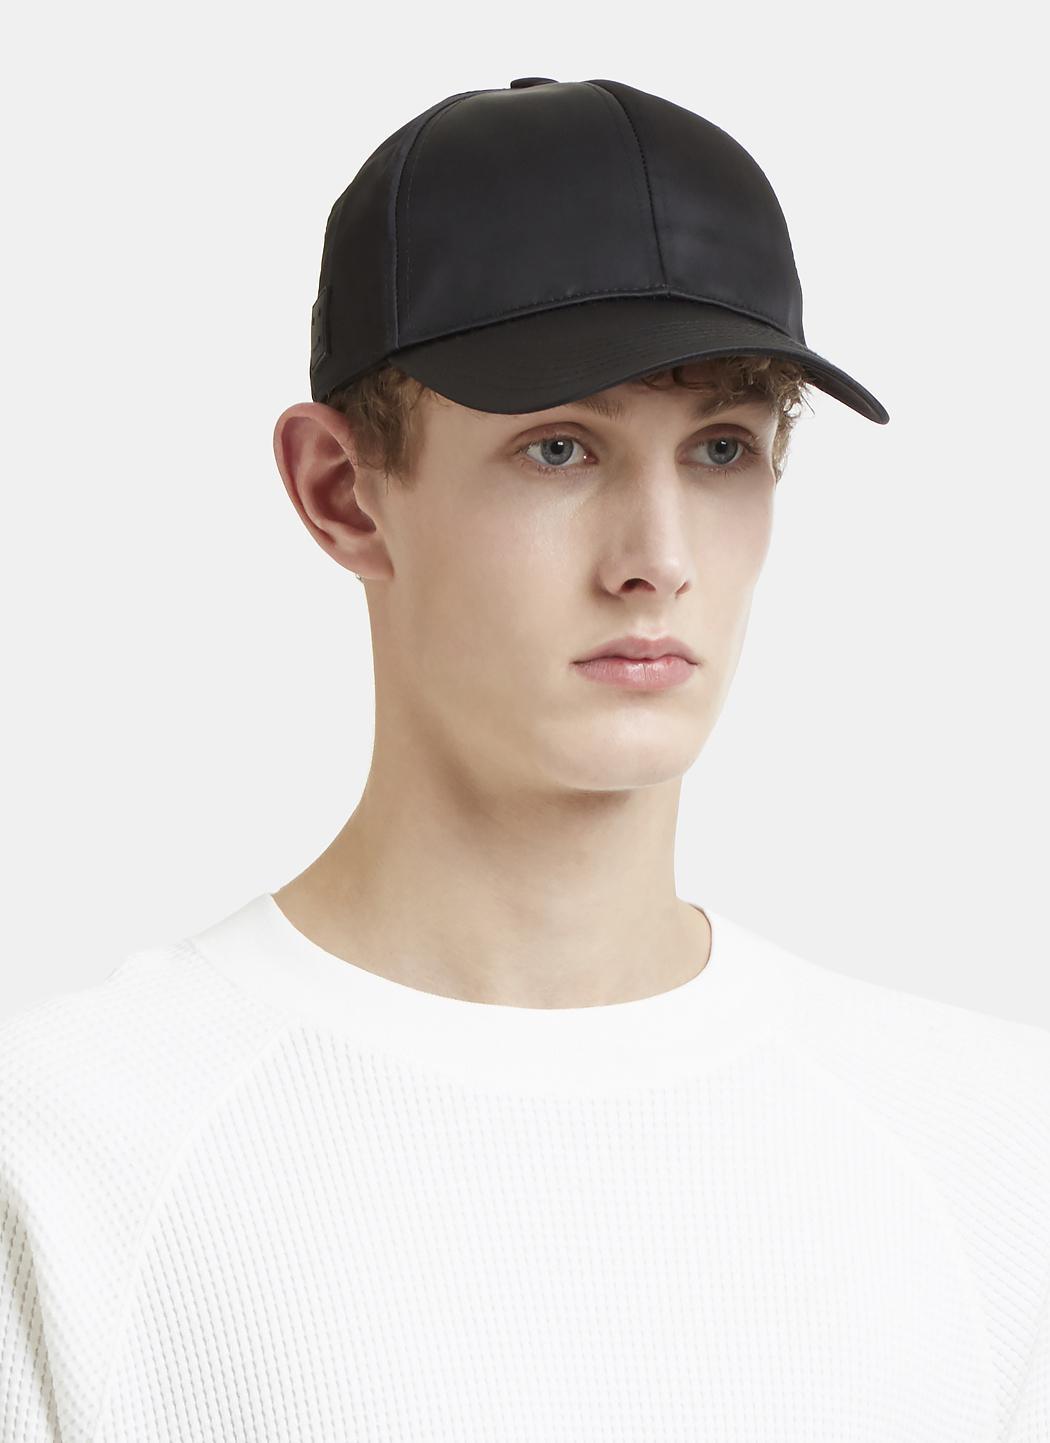 efde5033fce Lyst - Acne Studios Camp Matt Face Hat In Black in Black for Men